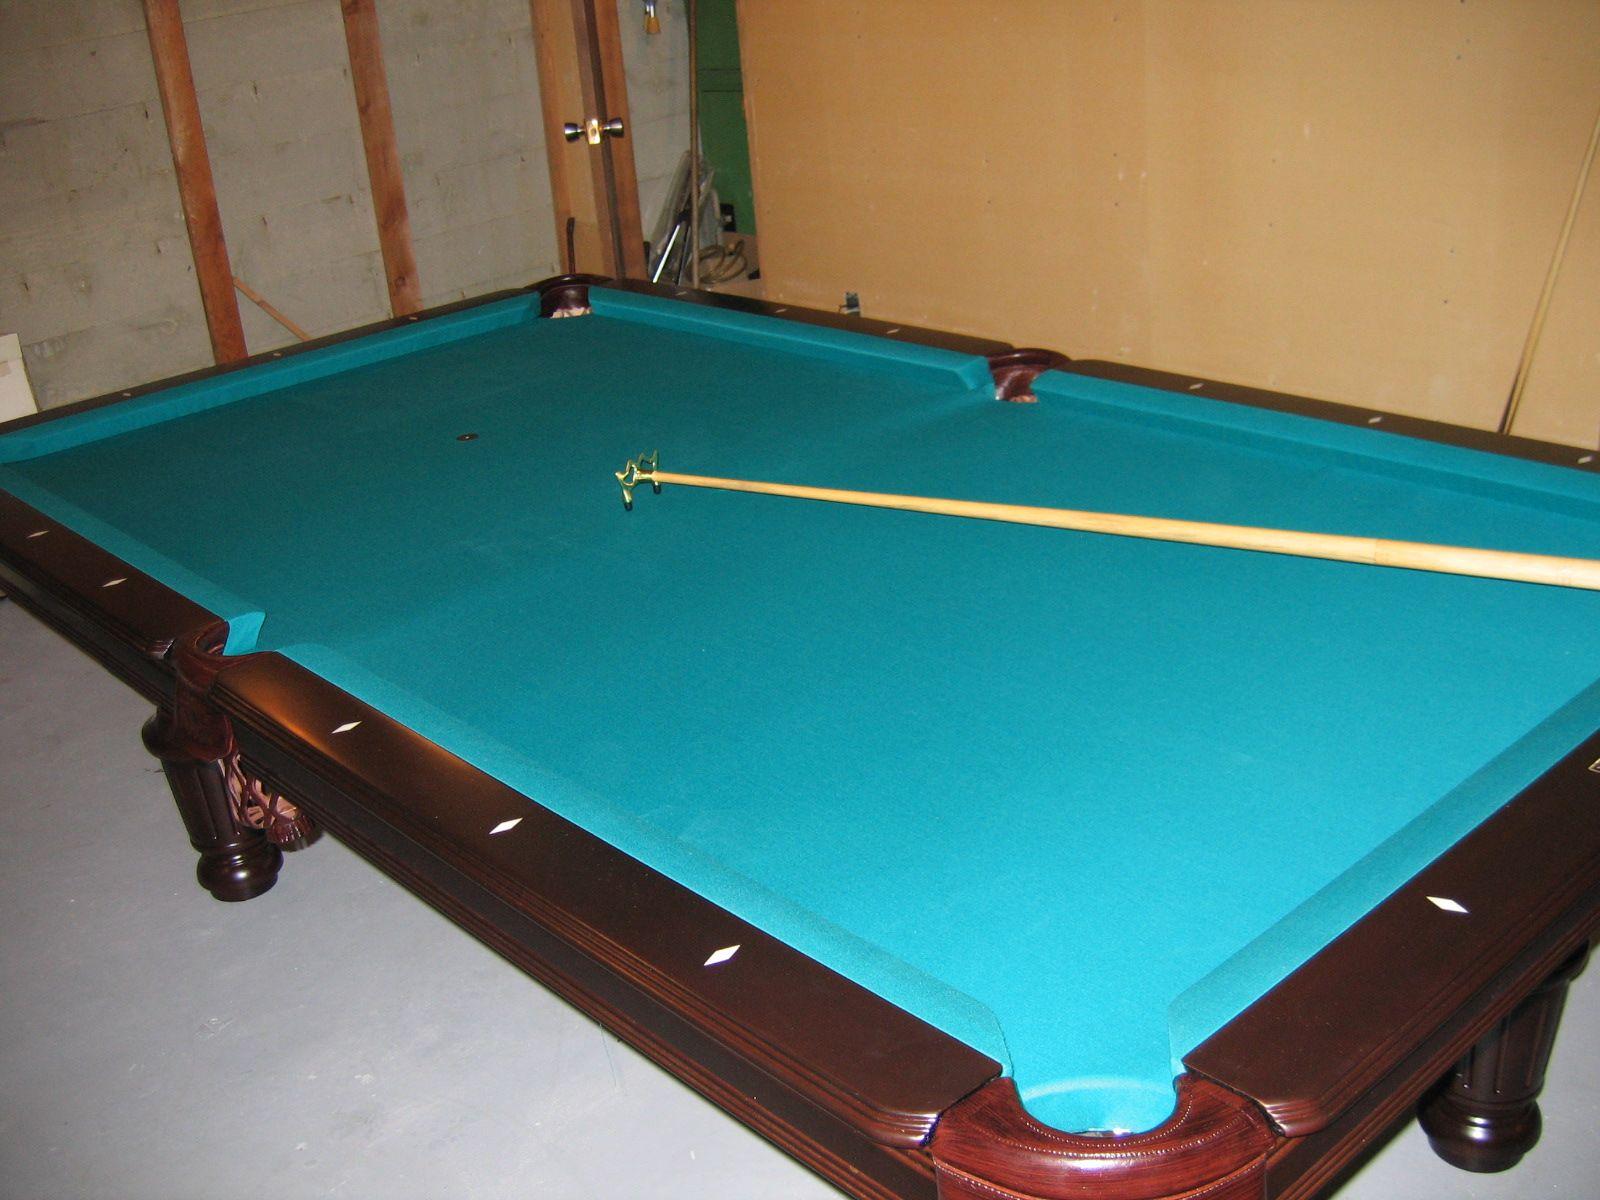 Pool Table Setup >> Just Had Our Pool Table Setup Great Job Thanks Again Will